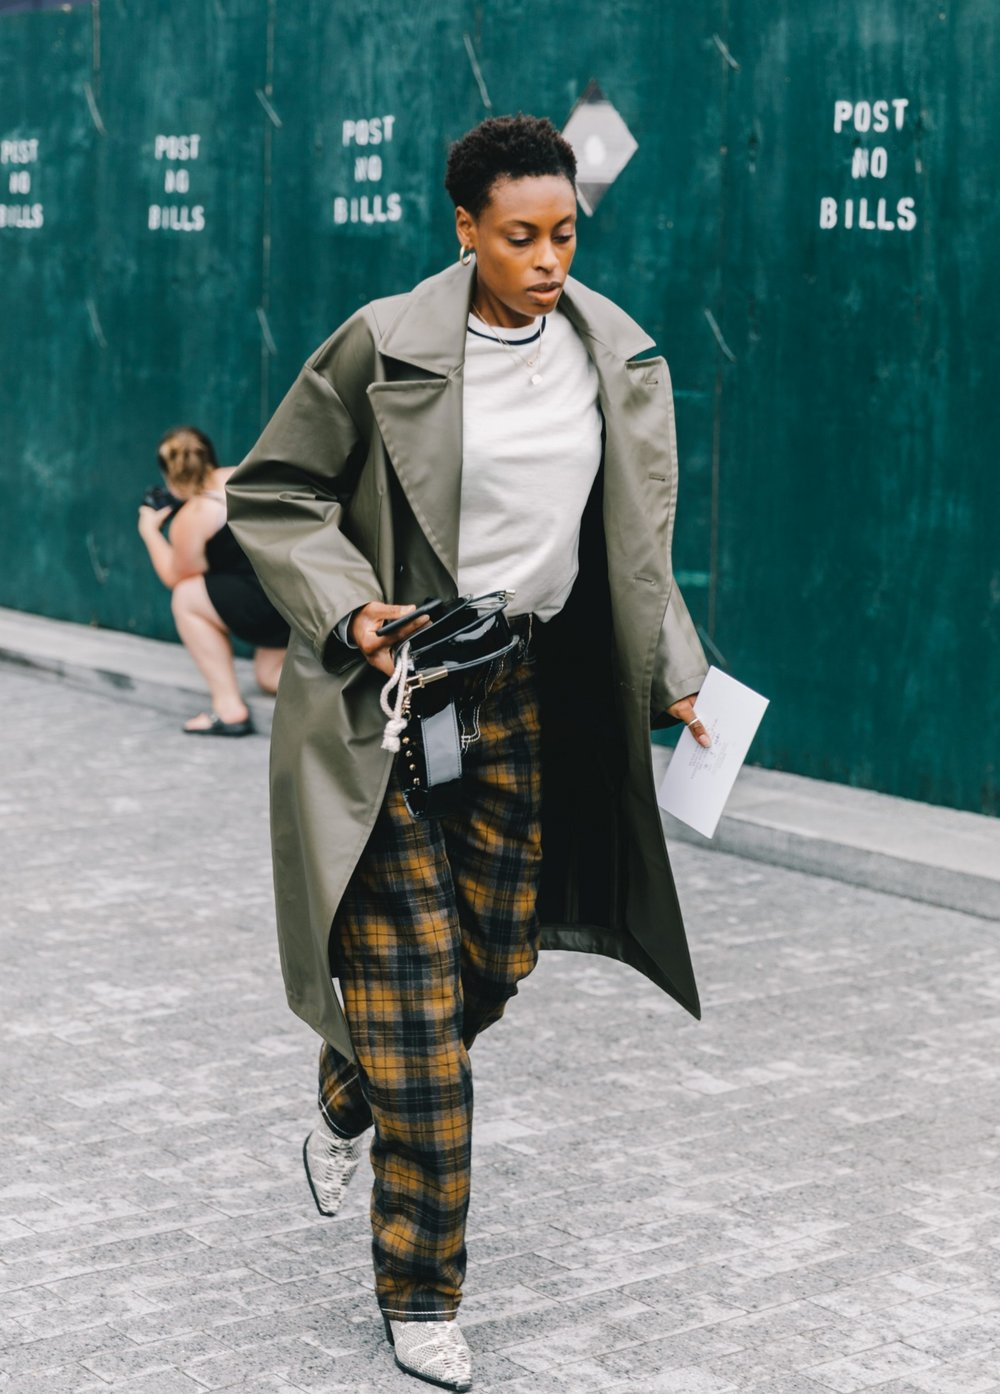 Collage_Vintage-NYFW-New_york_fashion_Week-Street_Style-53-3-2240x3360.jpg